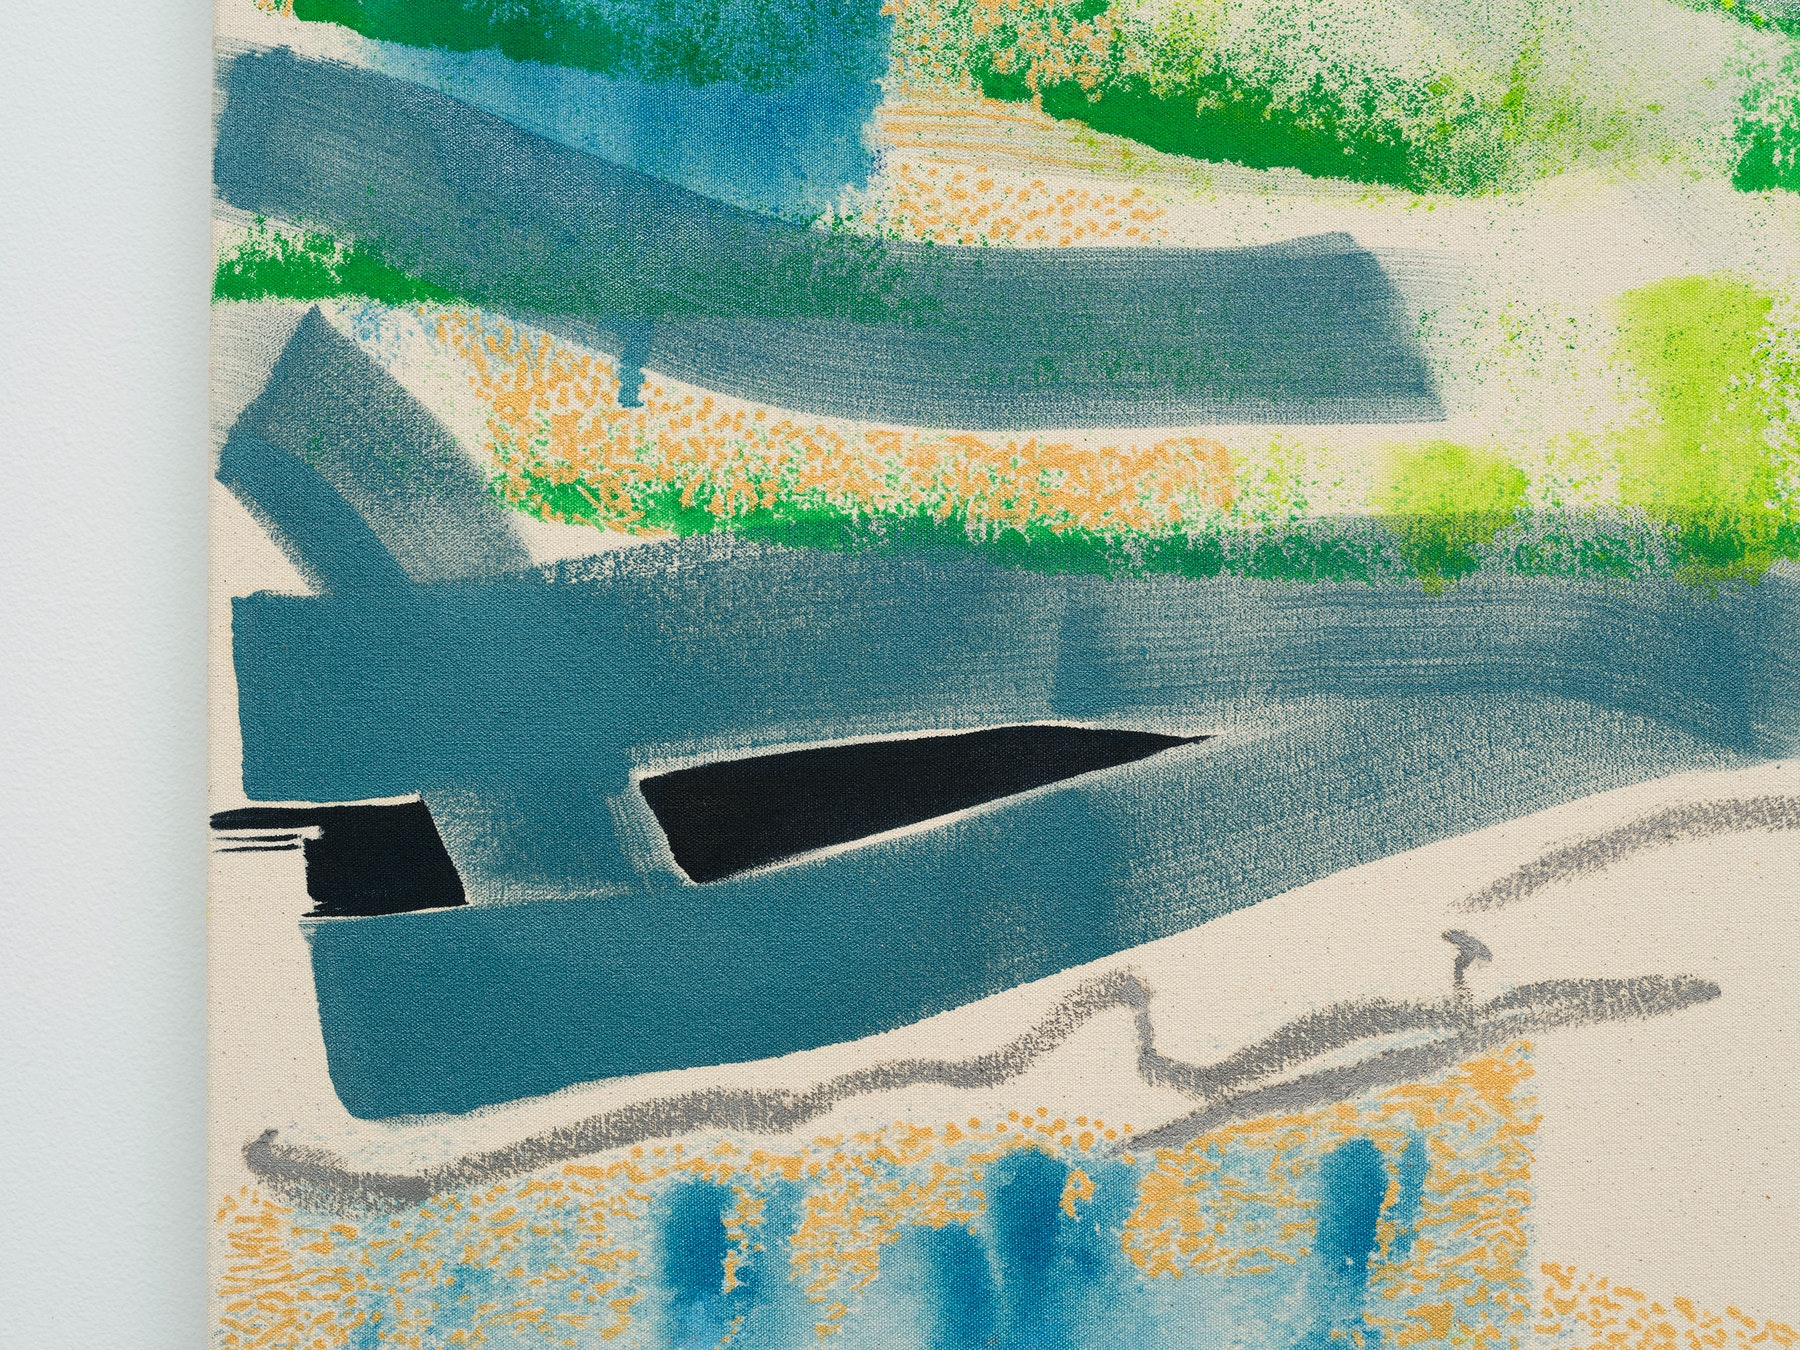 "Monique Van Genderen ""Snapshot 2,"" 2021 Oil on canvas 48"" x 36"" [HxW] (121.92 x 91.44 cm) Inventory #VGE412 Courtesy of the artist and Vielmetter Los Angeles Photo credit: Jeff McLane"